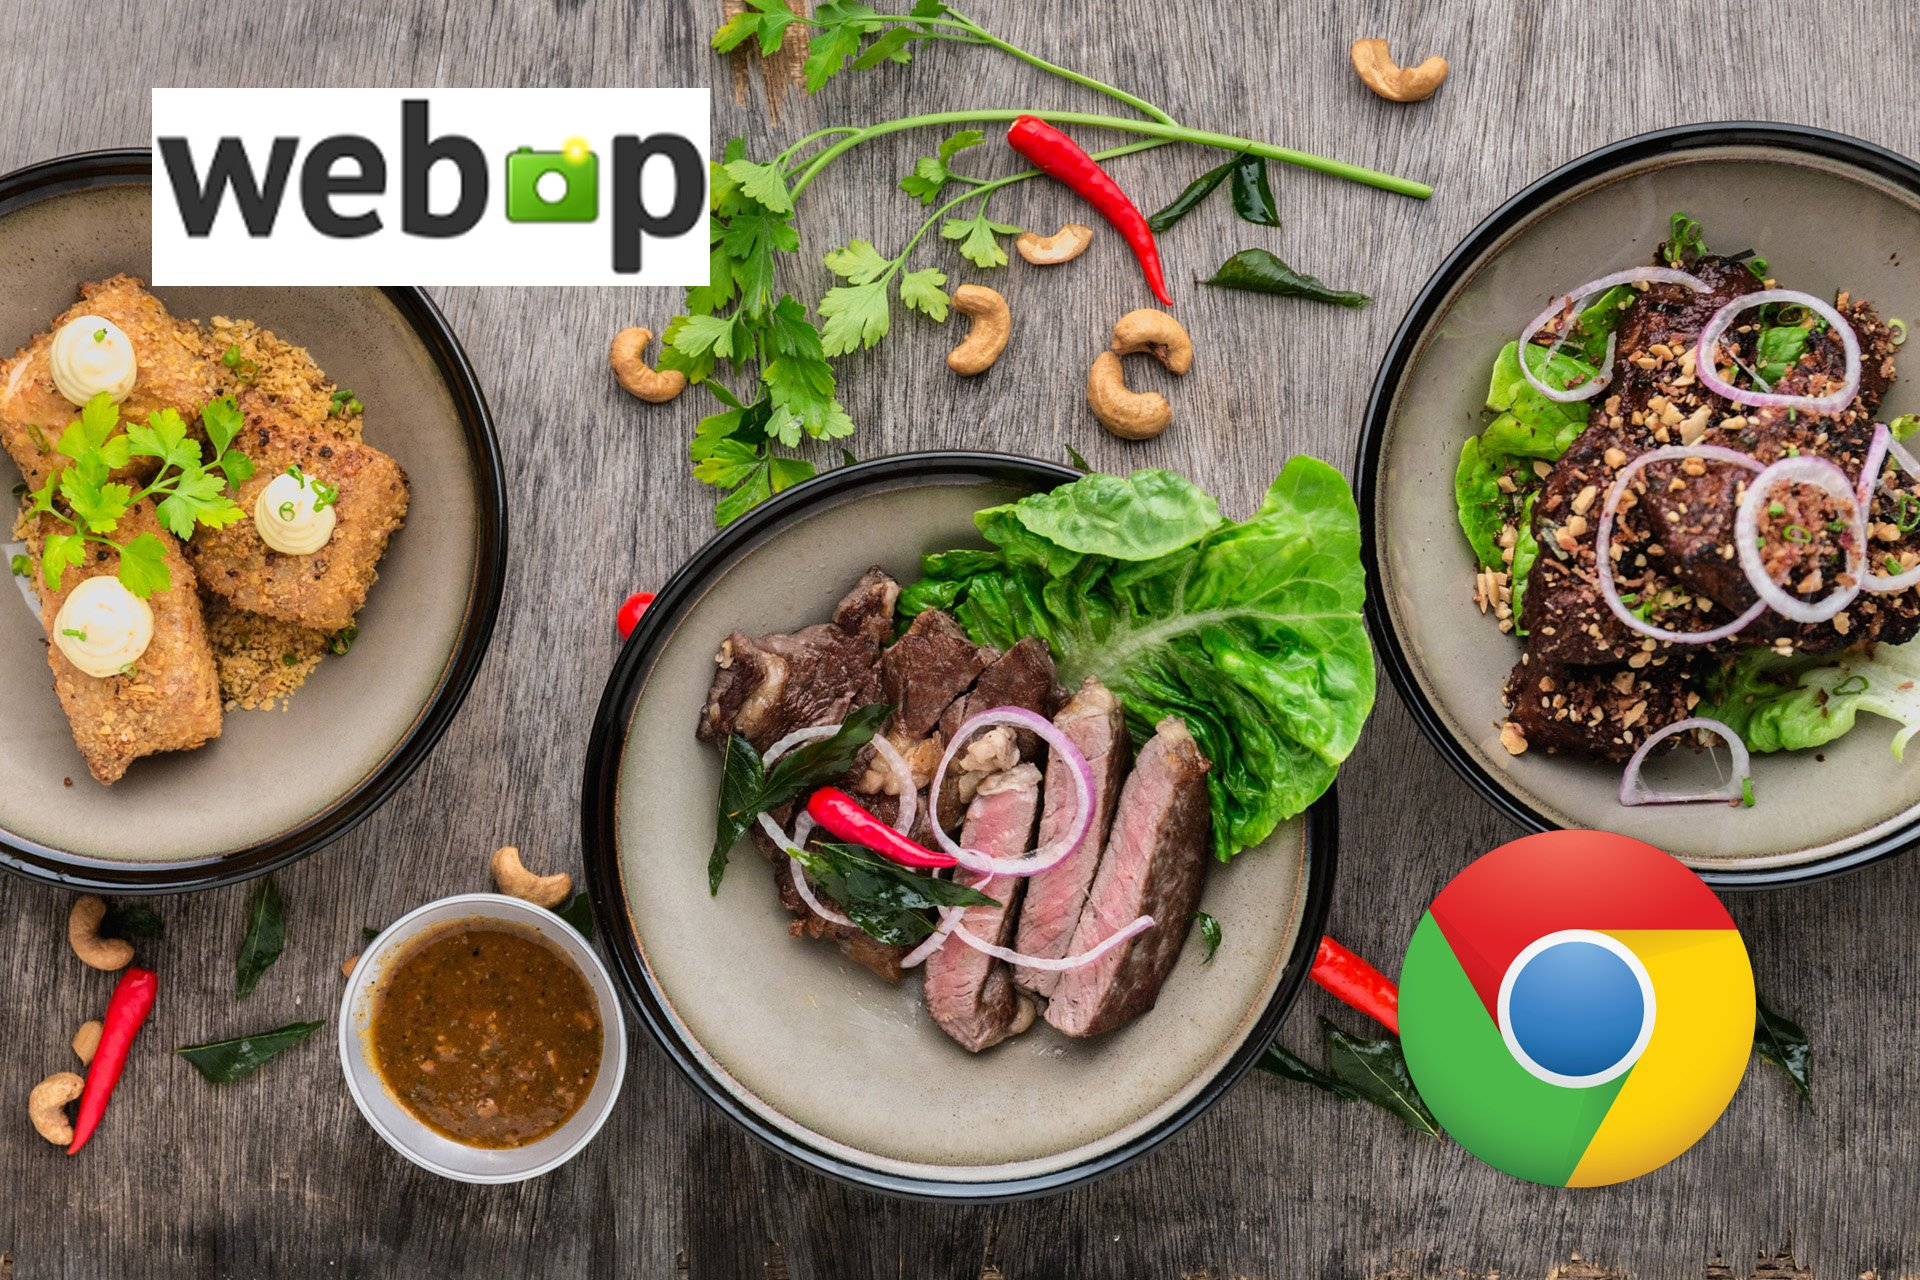 Obrázky WebP